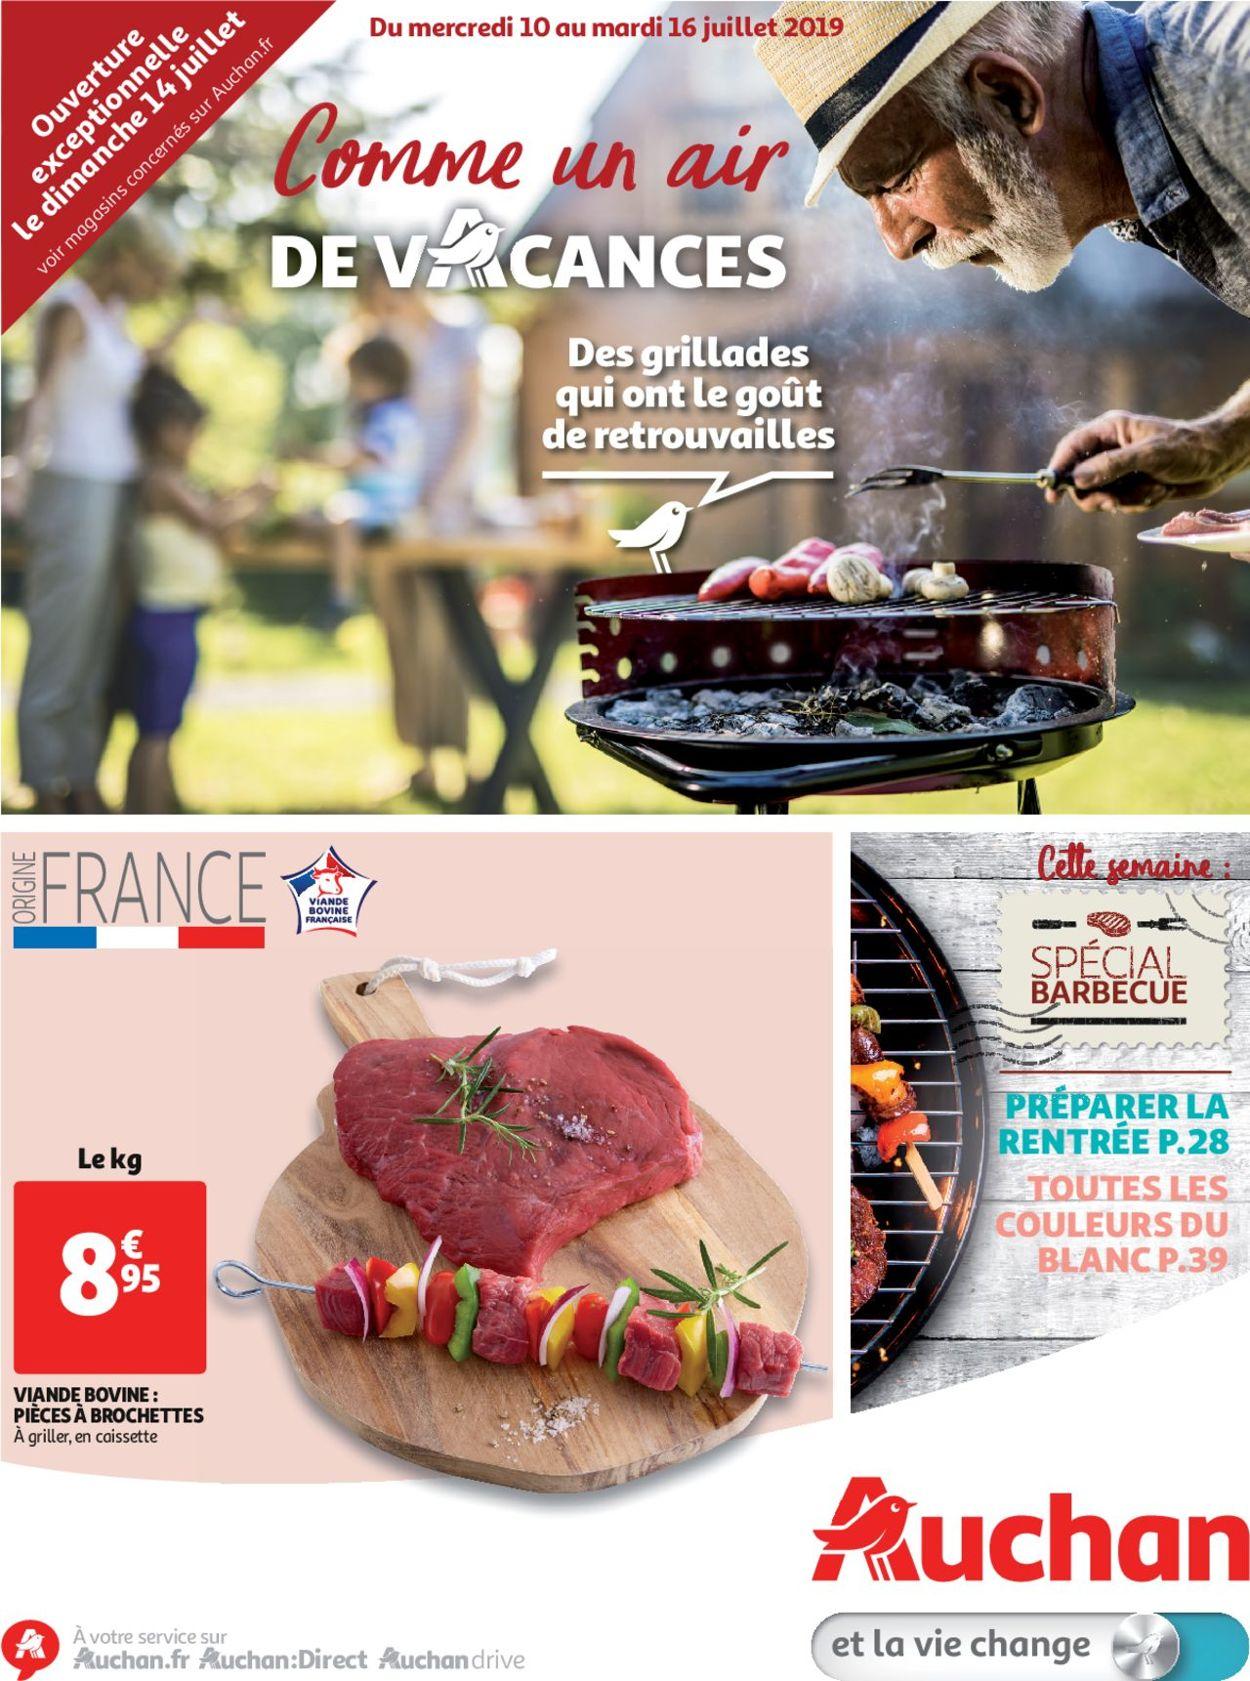 Auchan Catalogue - 10.07-16.07.2019